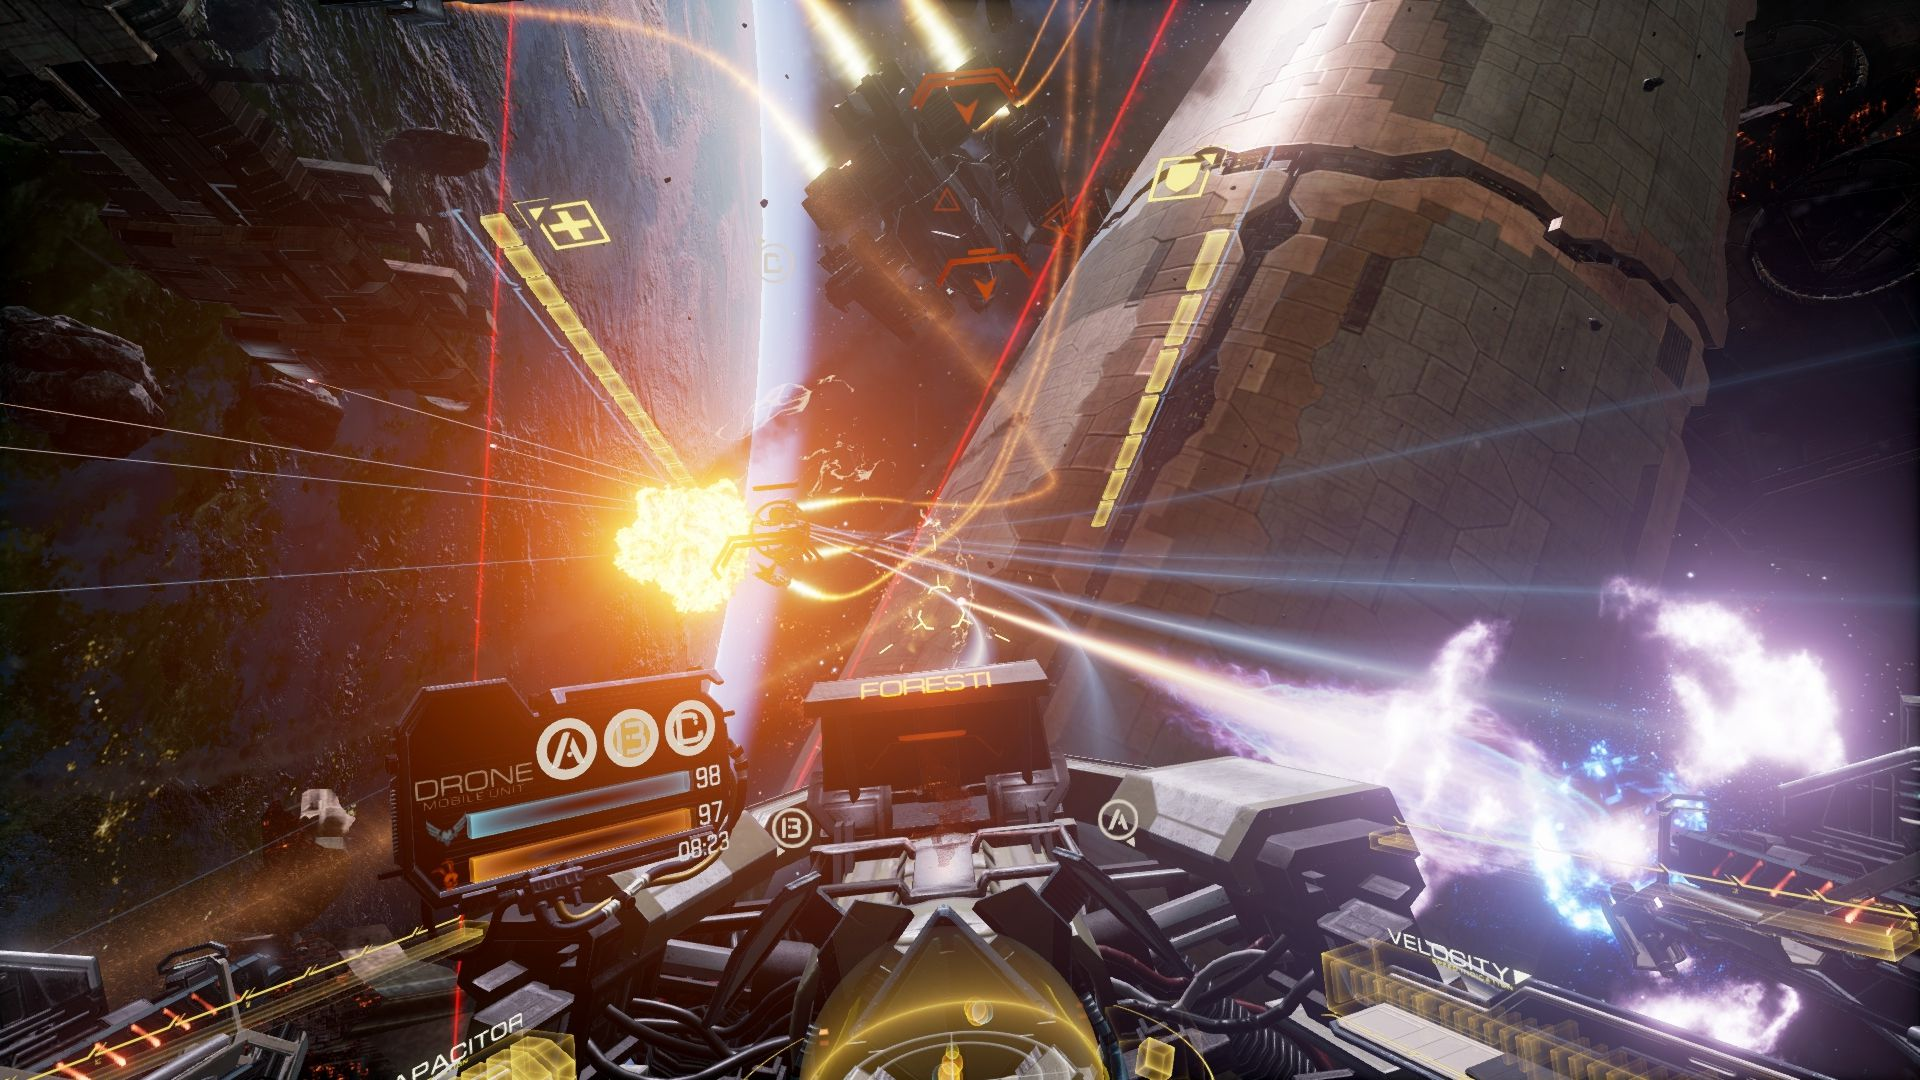 Eve: Valkyrie alpha: Hands-on with the Oculus Rift's killer app | Polygon